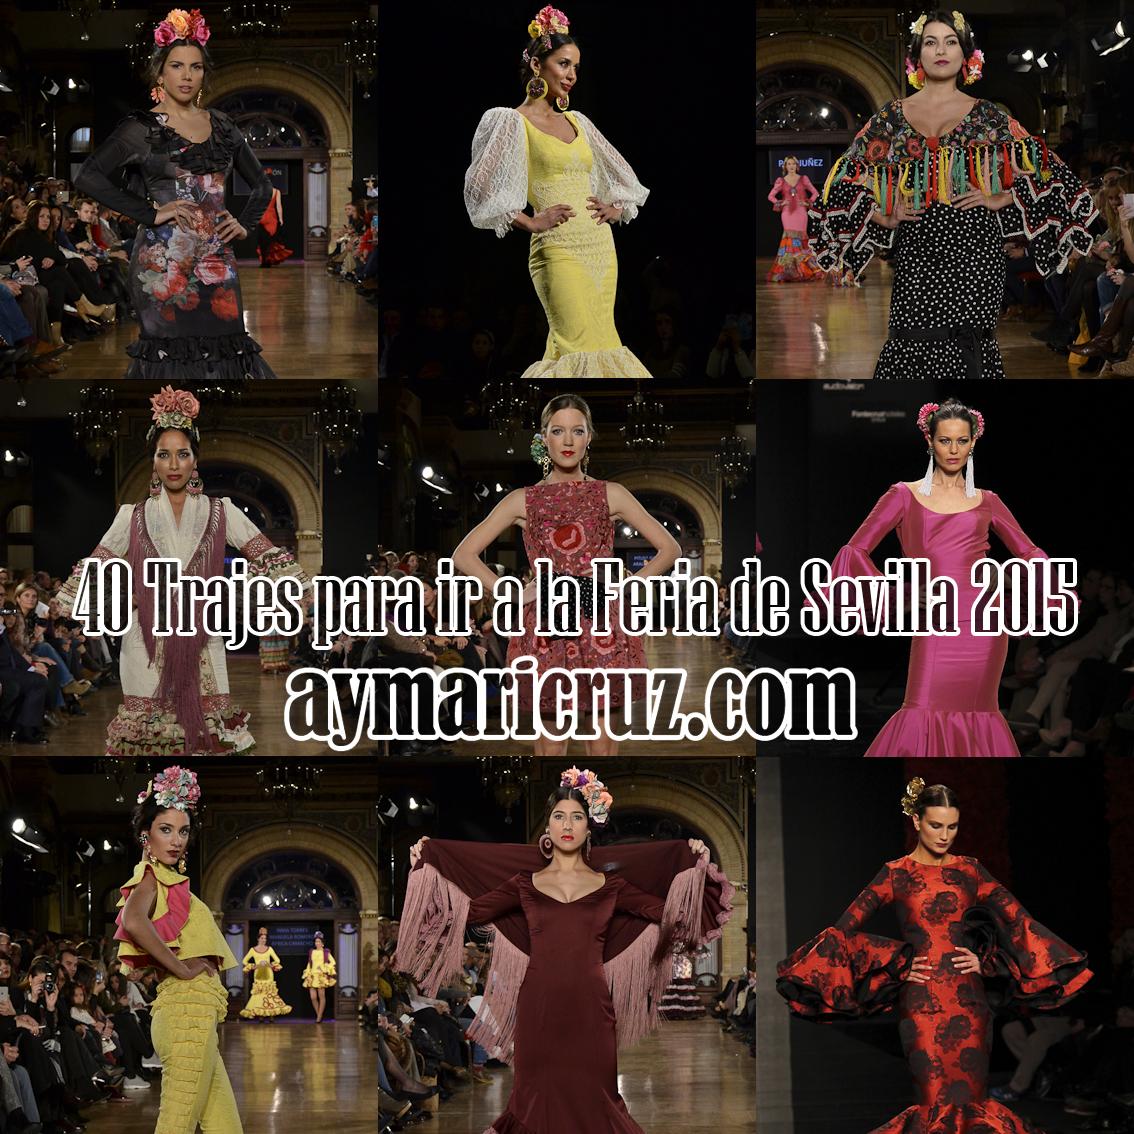 40 Trajes para ir a la Feria de Sevilla 2015 (2ª parte)